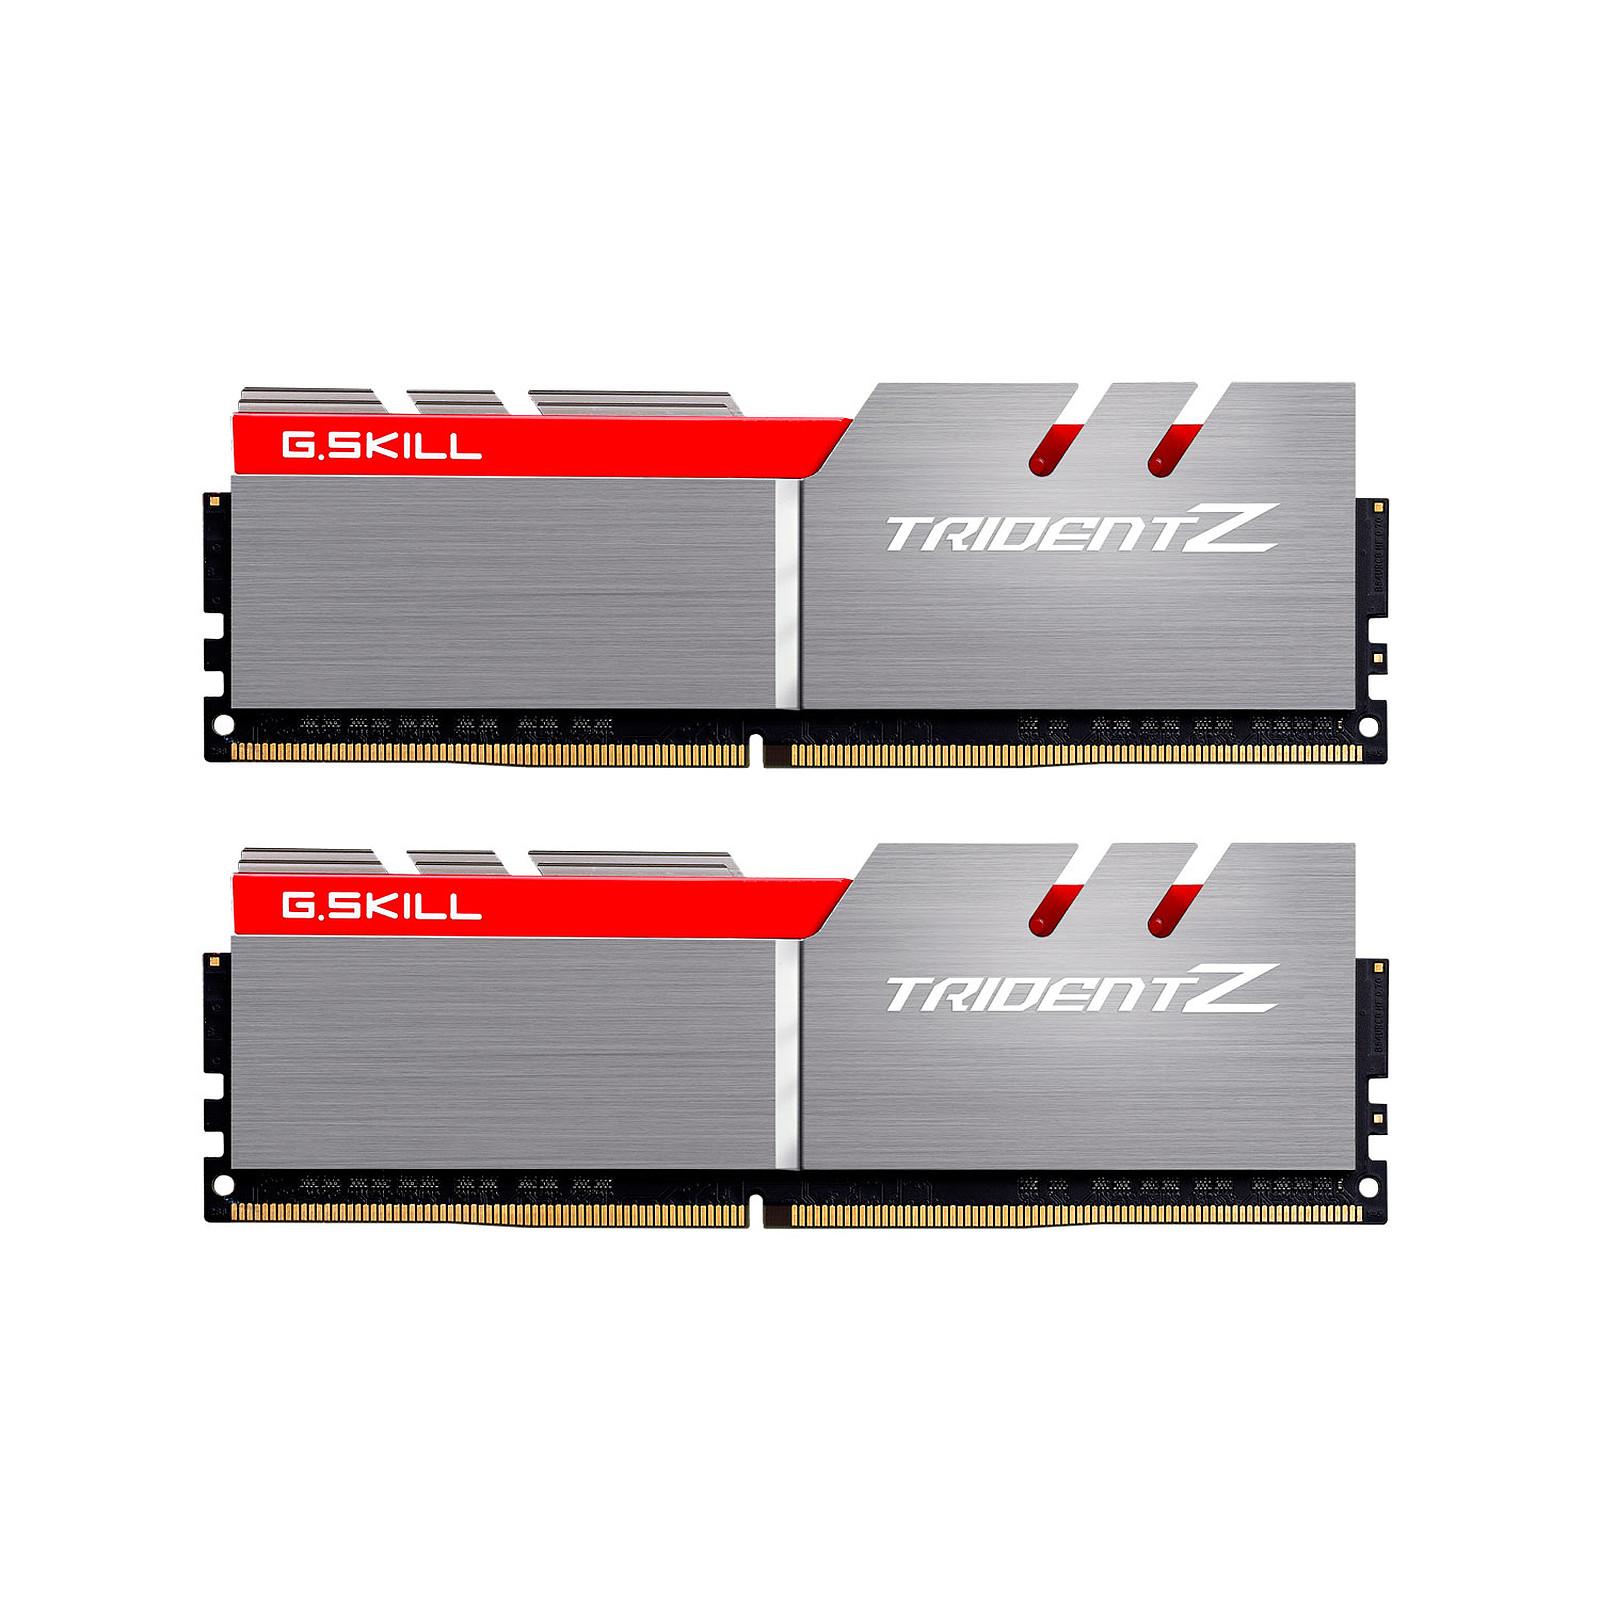 G.Skill Trident Z 16 Go (2x 8 Go) DDR4 2800 MHz CL15